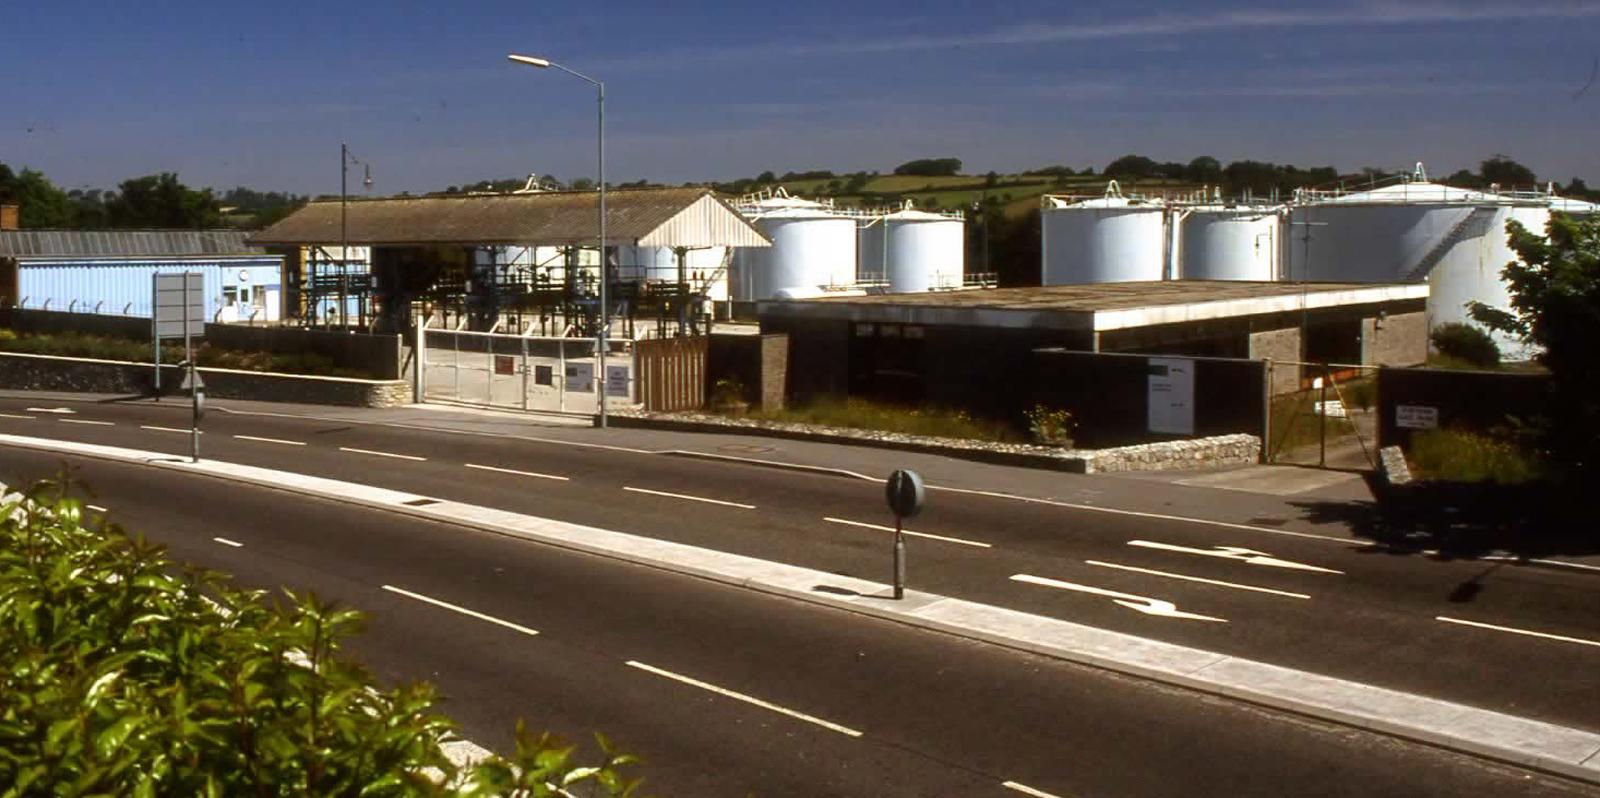 Ponsharden Fuel Depot - Raymond